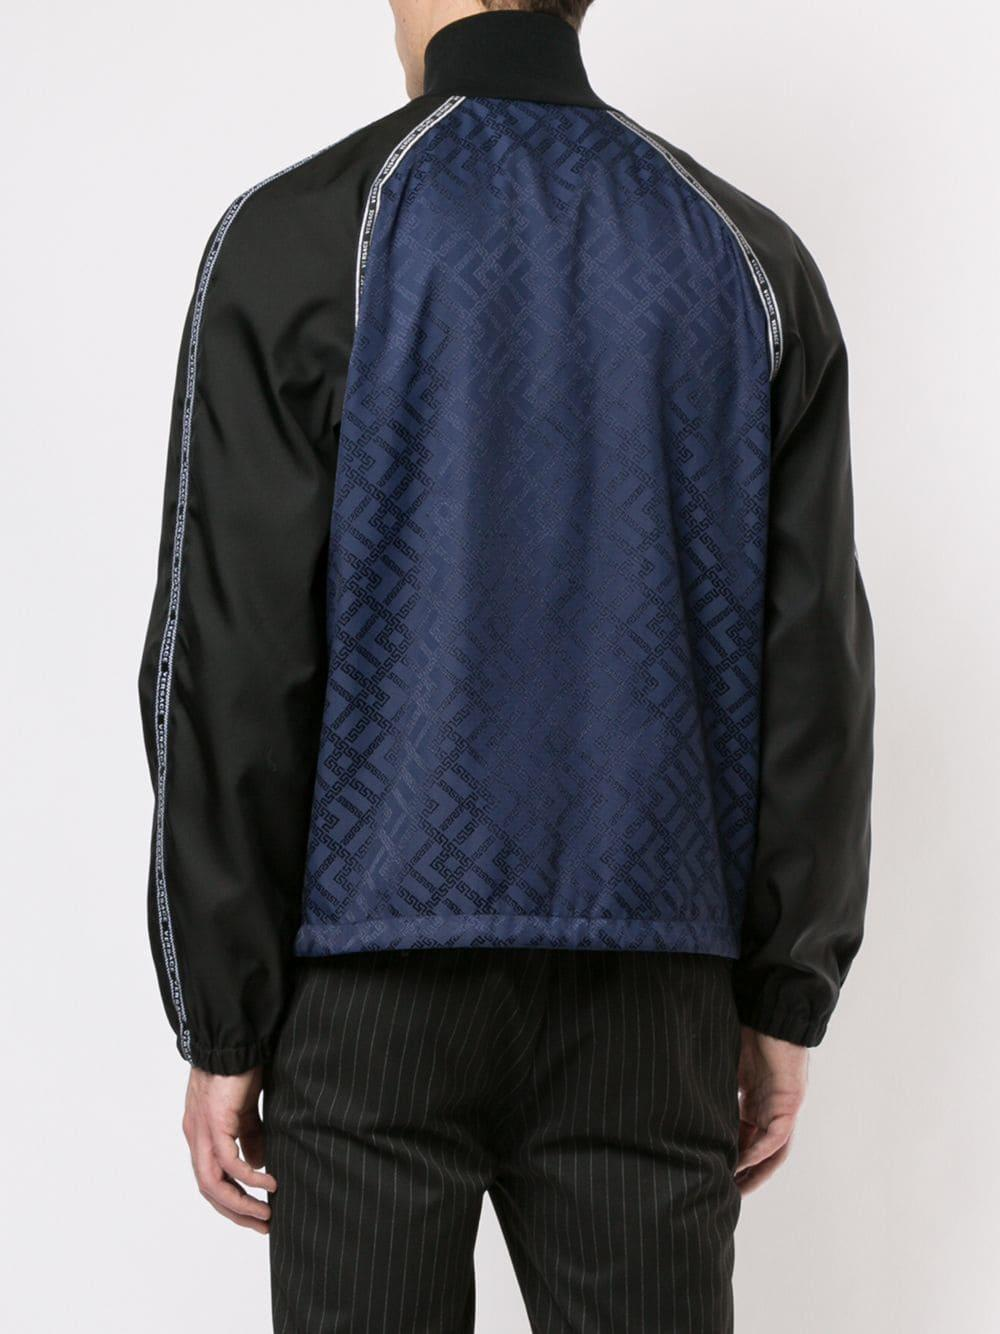 6e135450 Lyst - Versace Monogram Jacquard Track Jacket in Blue for Men